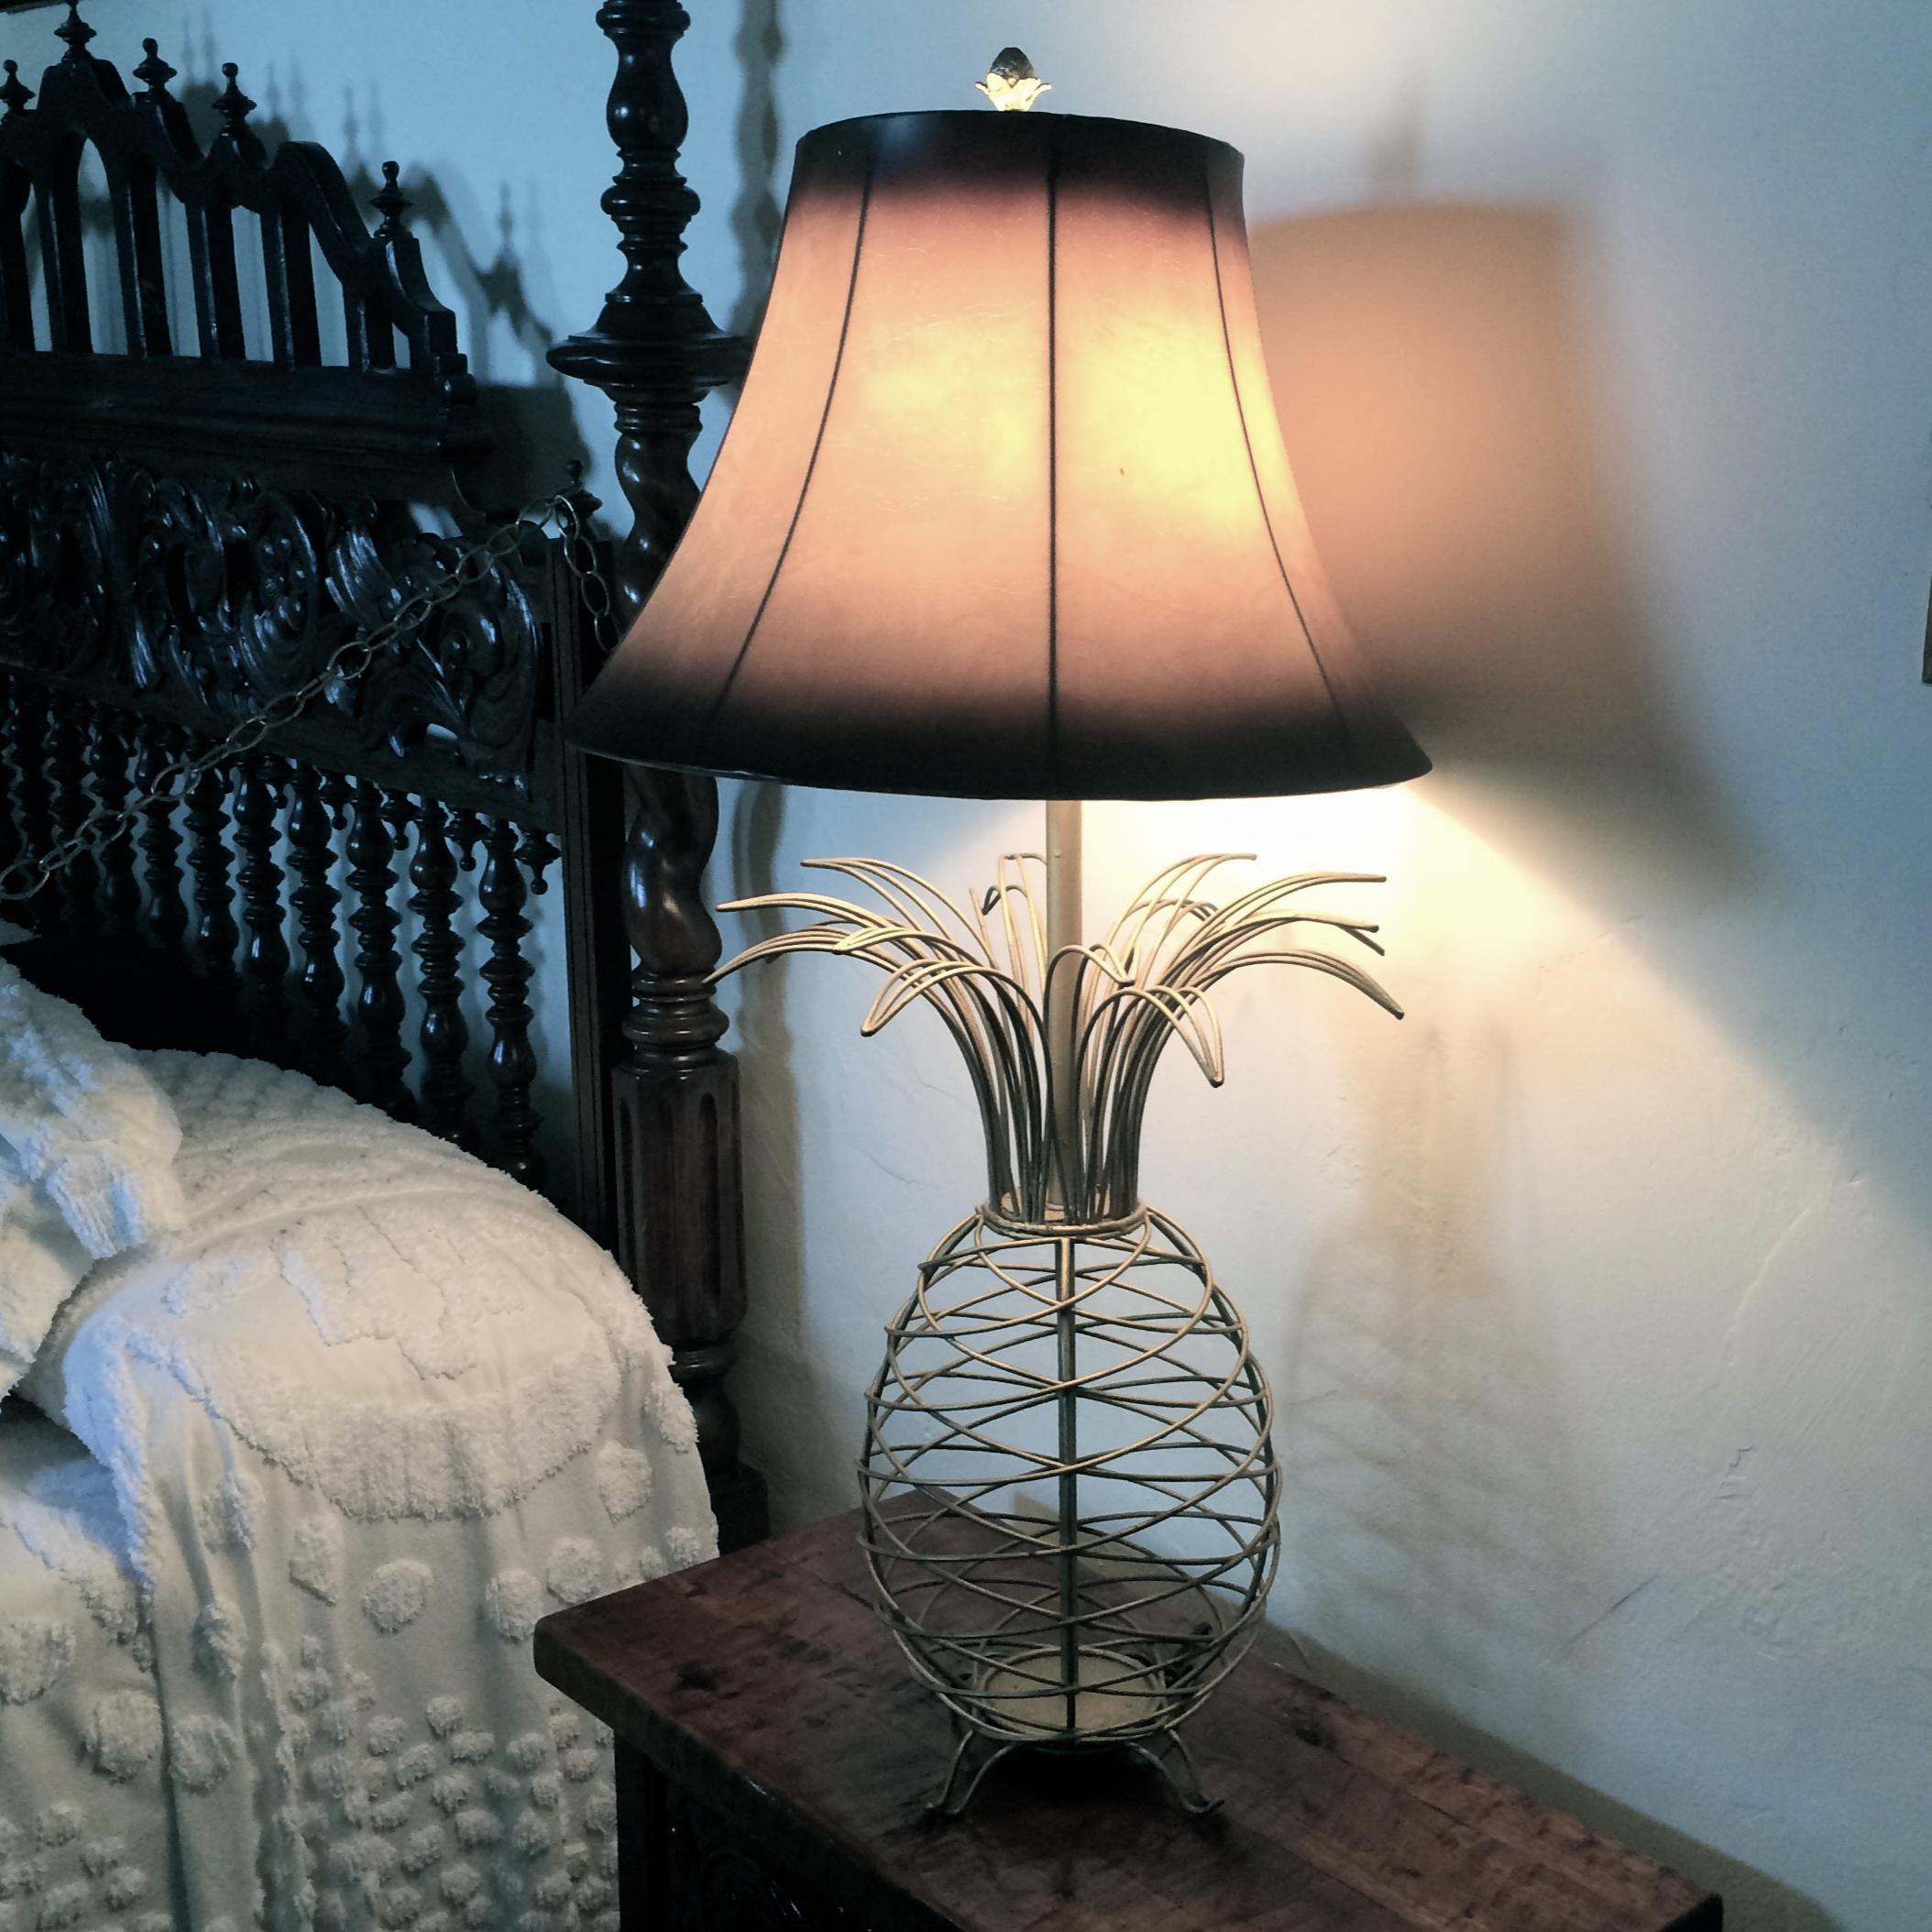 The Hemingway House's Pineapple Lamps